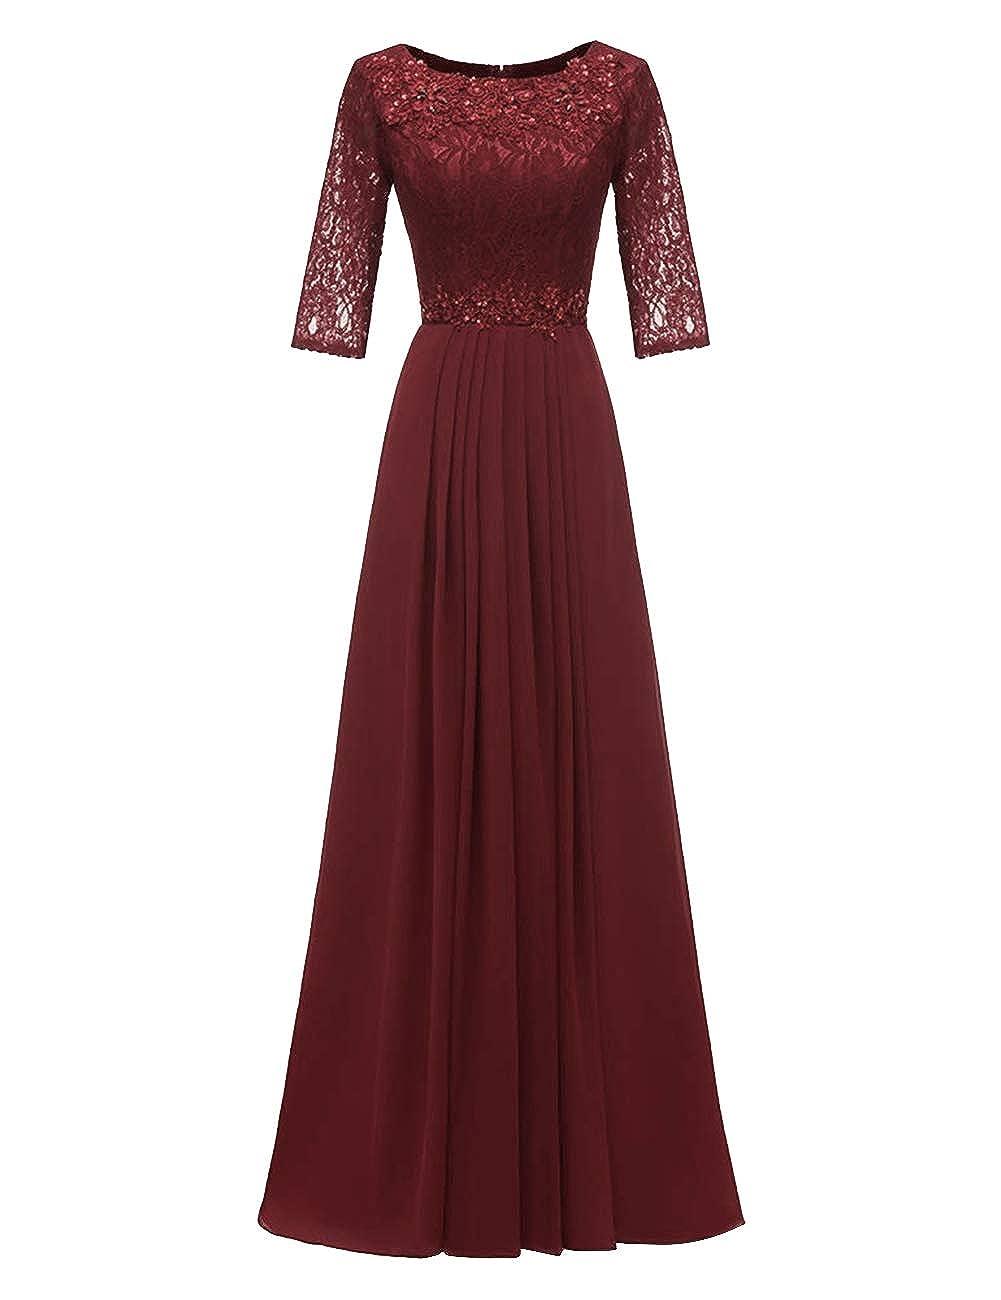 Dark Burgundy H.S.D Evening Dresses Long Prom Dresses Lace Bridesmaid Dresses Evening Formal Gowns